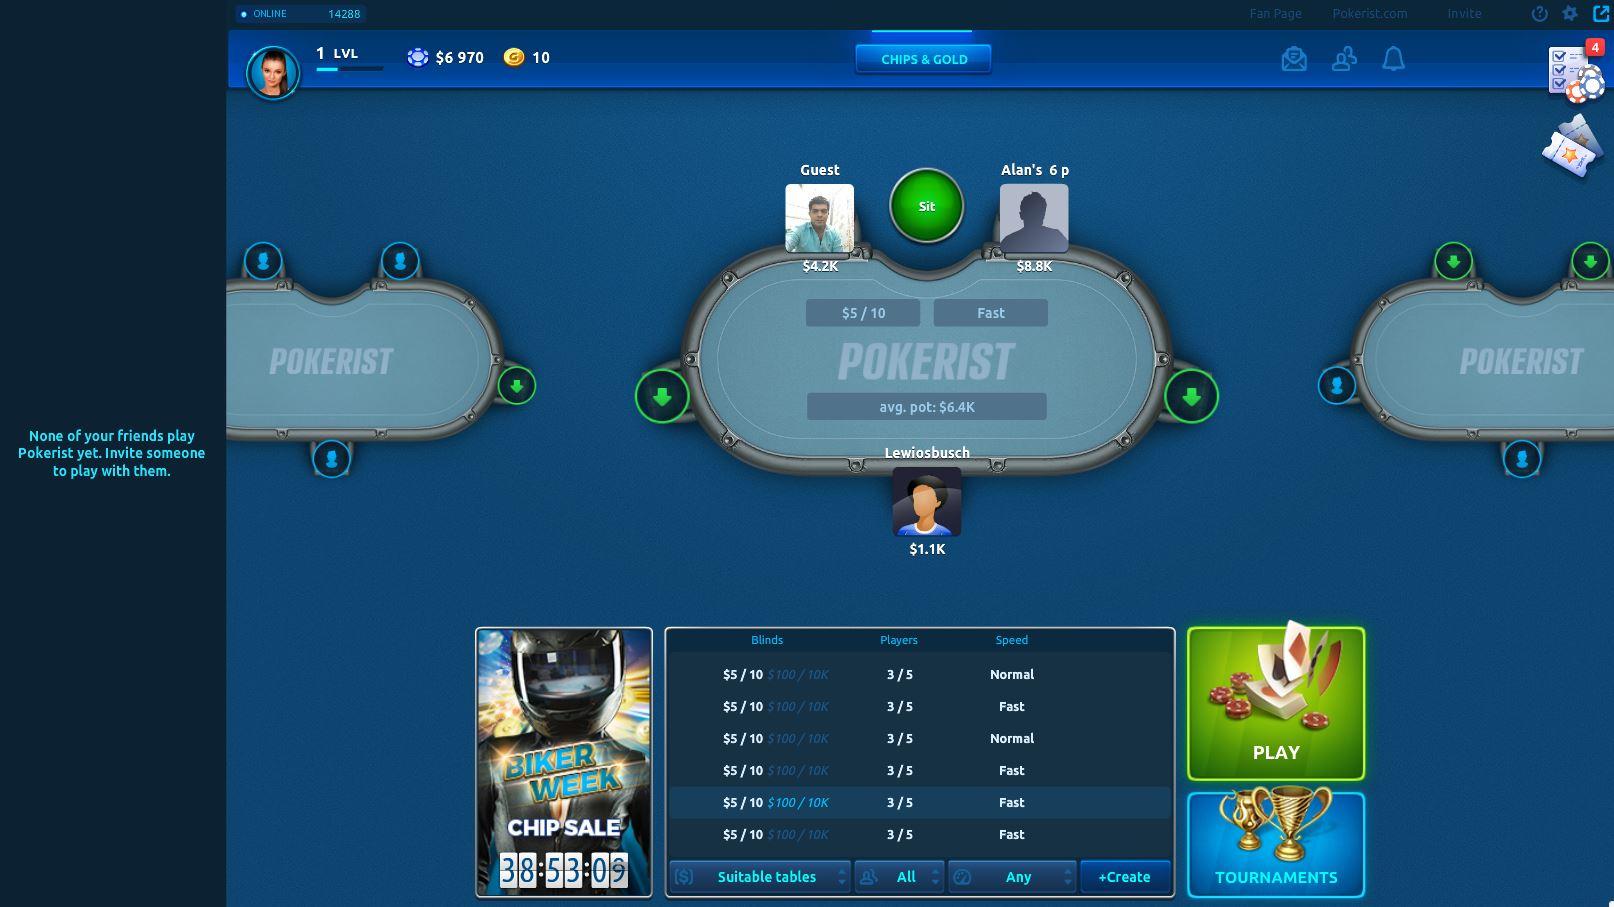 Pokerist Facebook Poker App